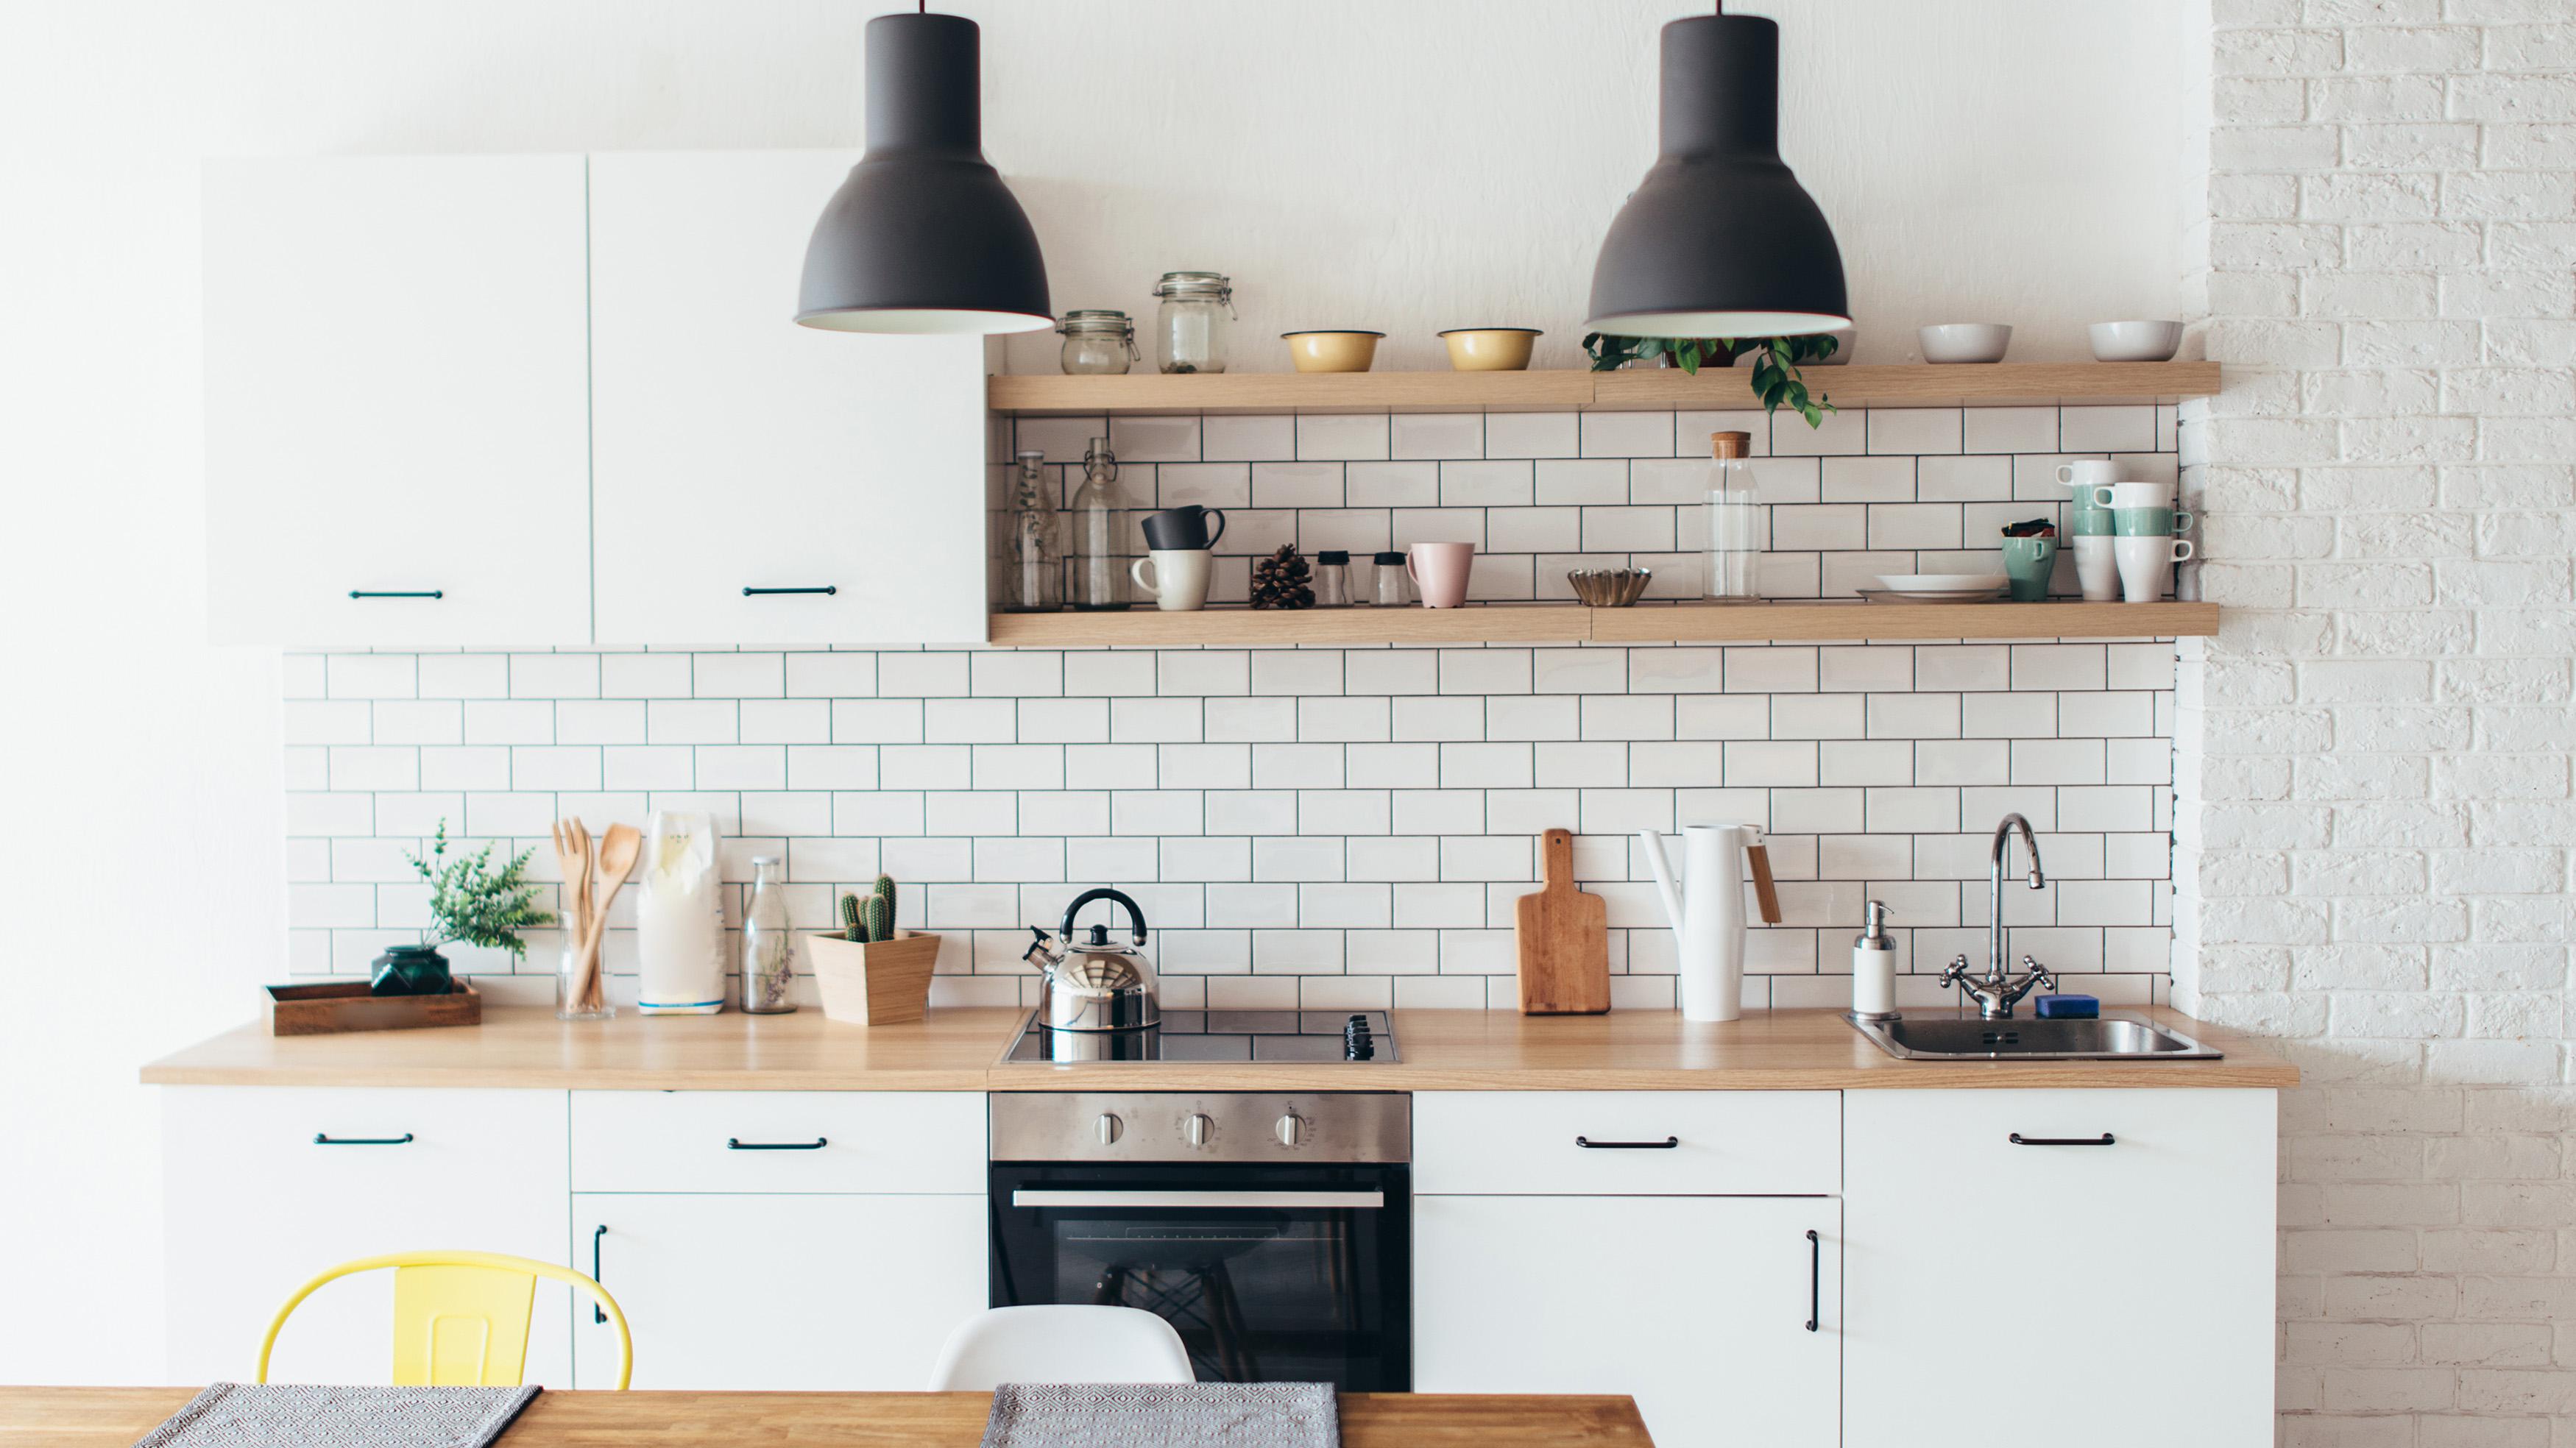 Kitchen Gadgets That Make Cooking